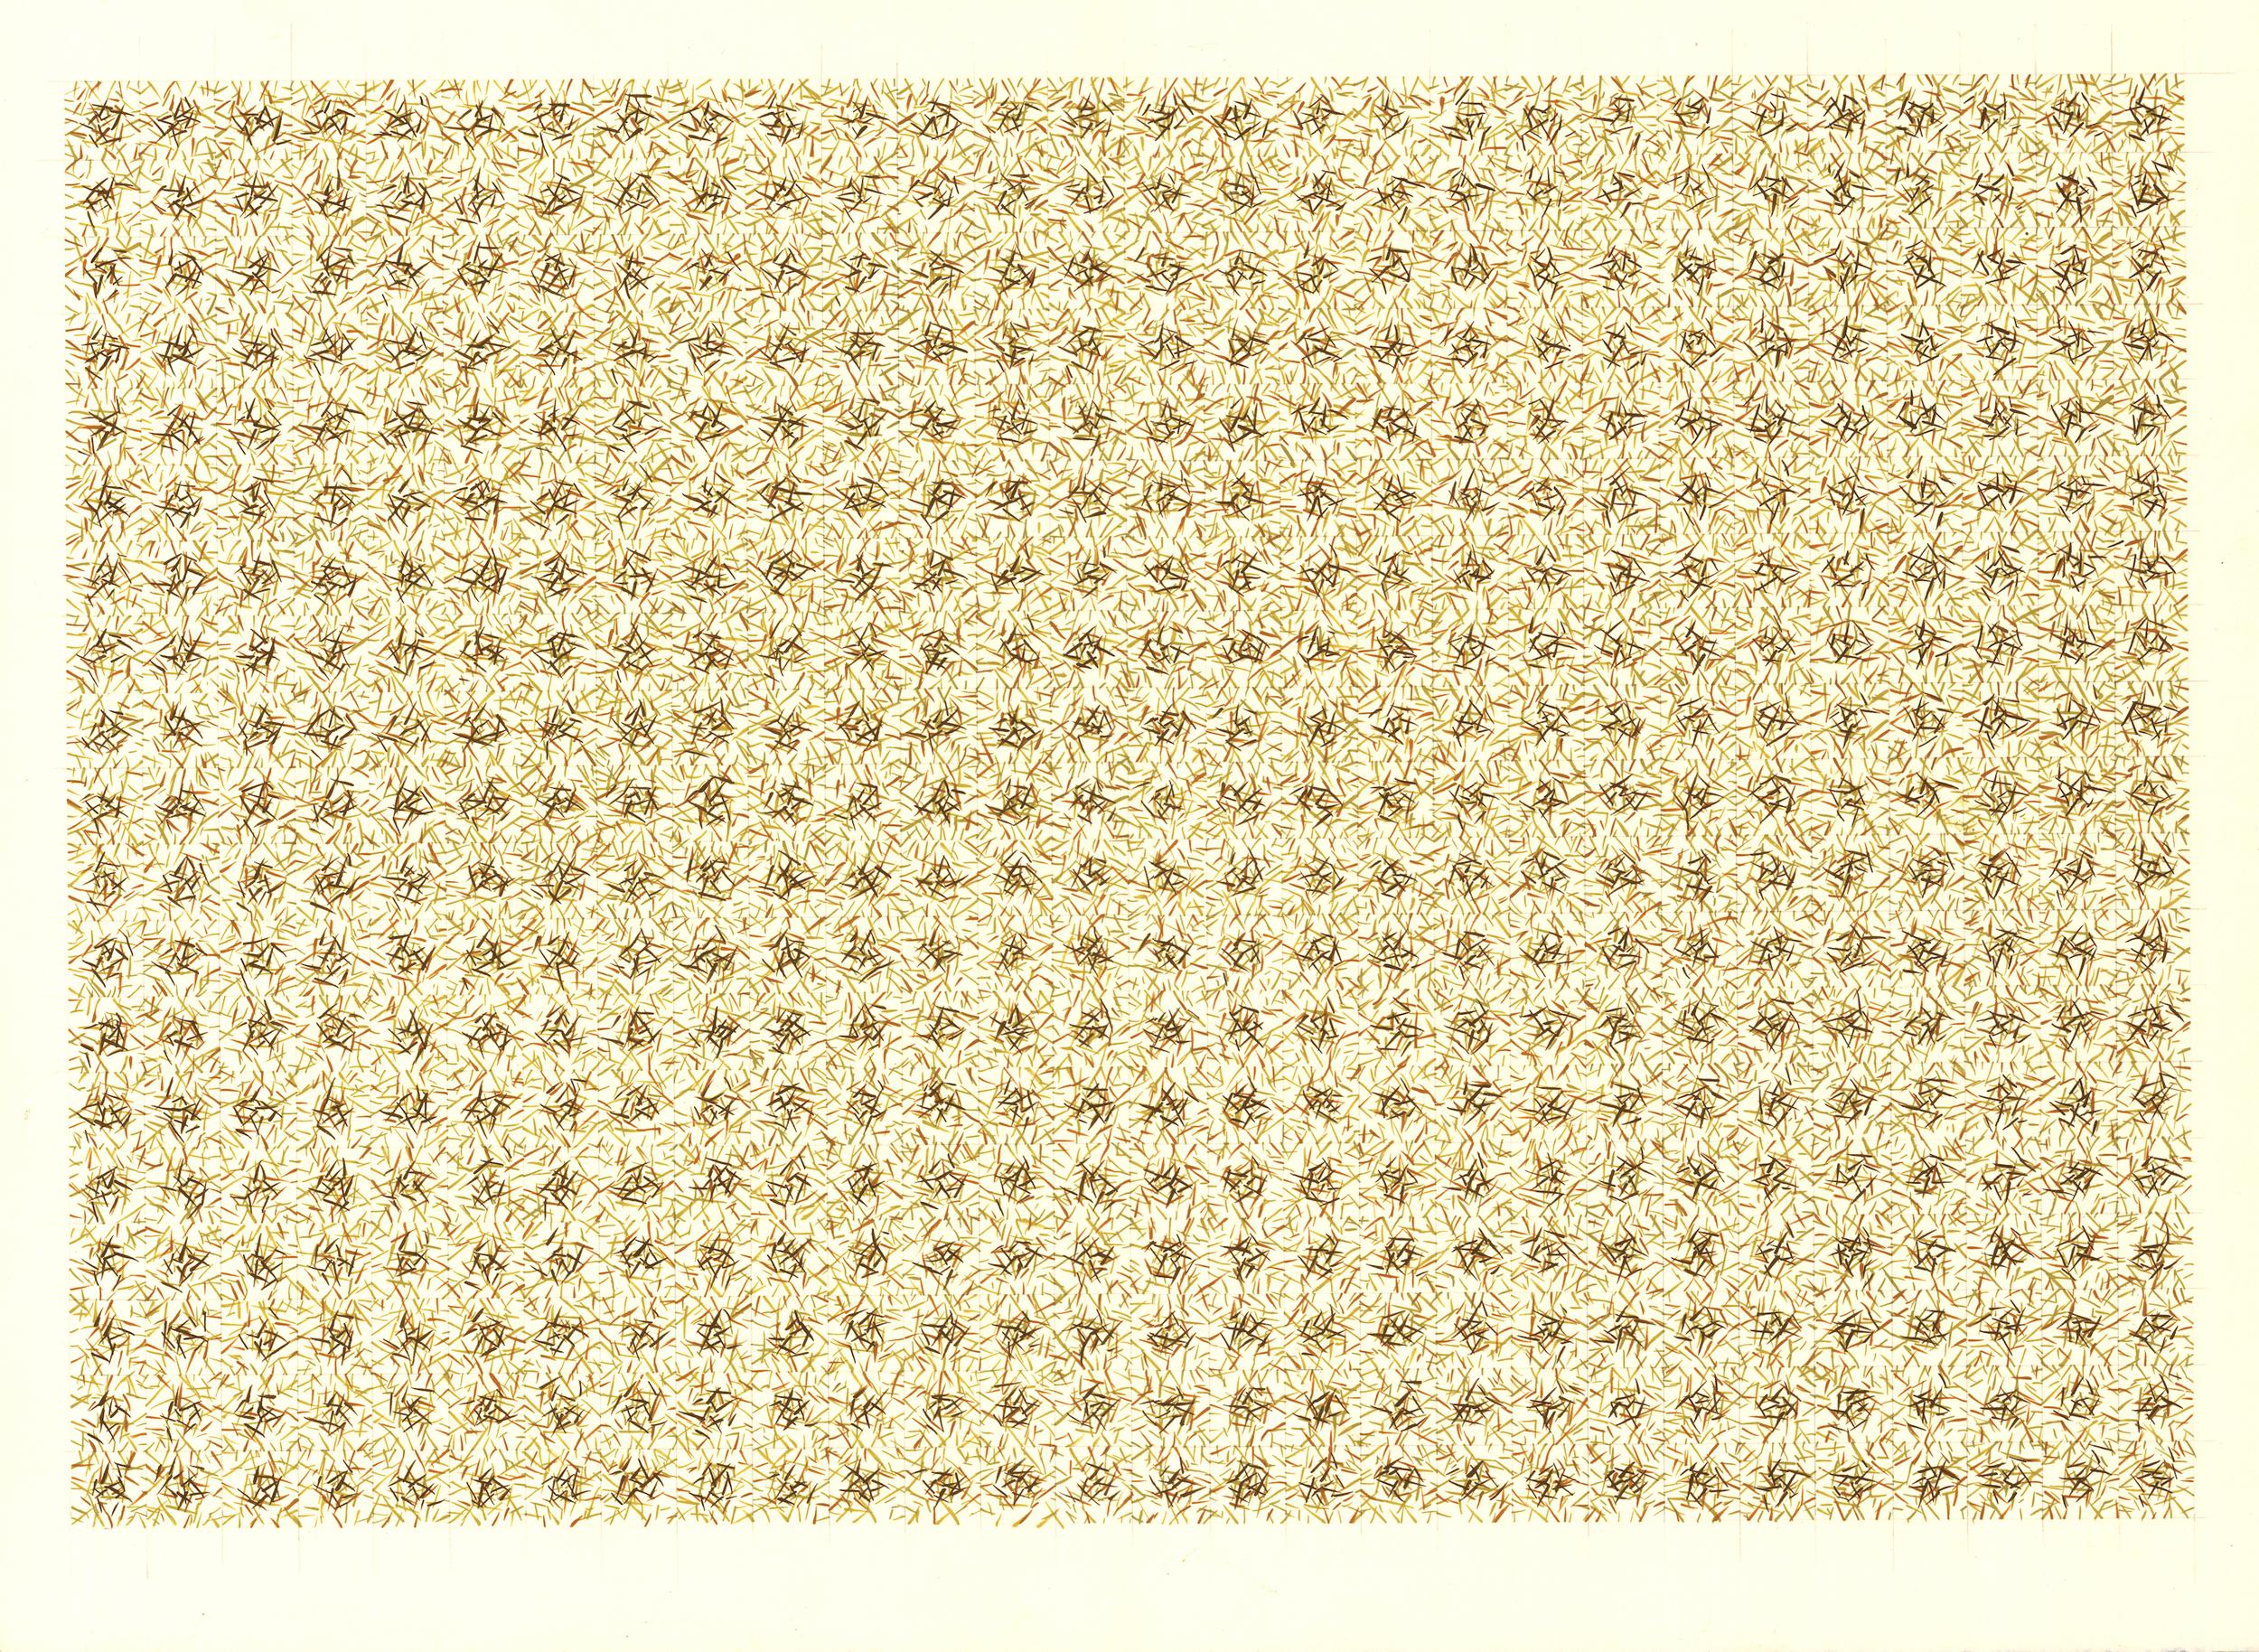 "Continuum 47     Jacqueline Ott, 1998  gouache, graphite, on paper  22"" x 30"""